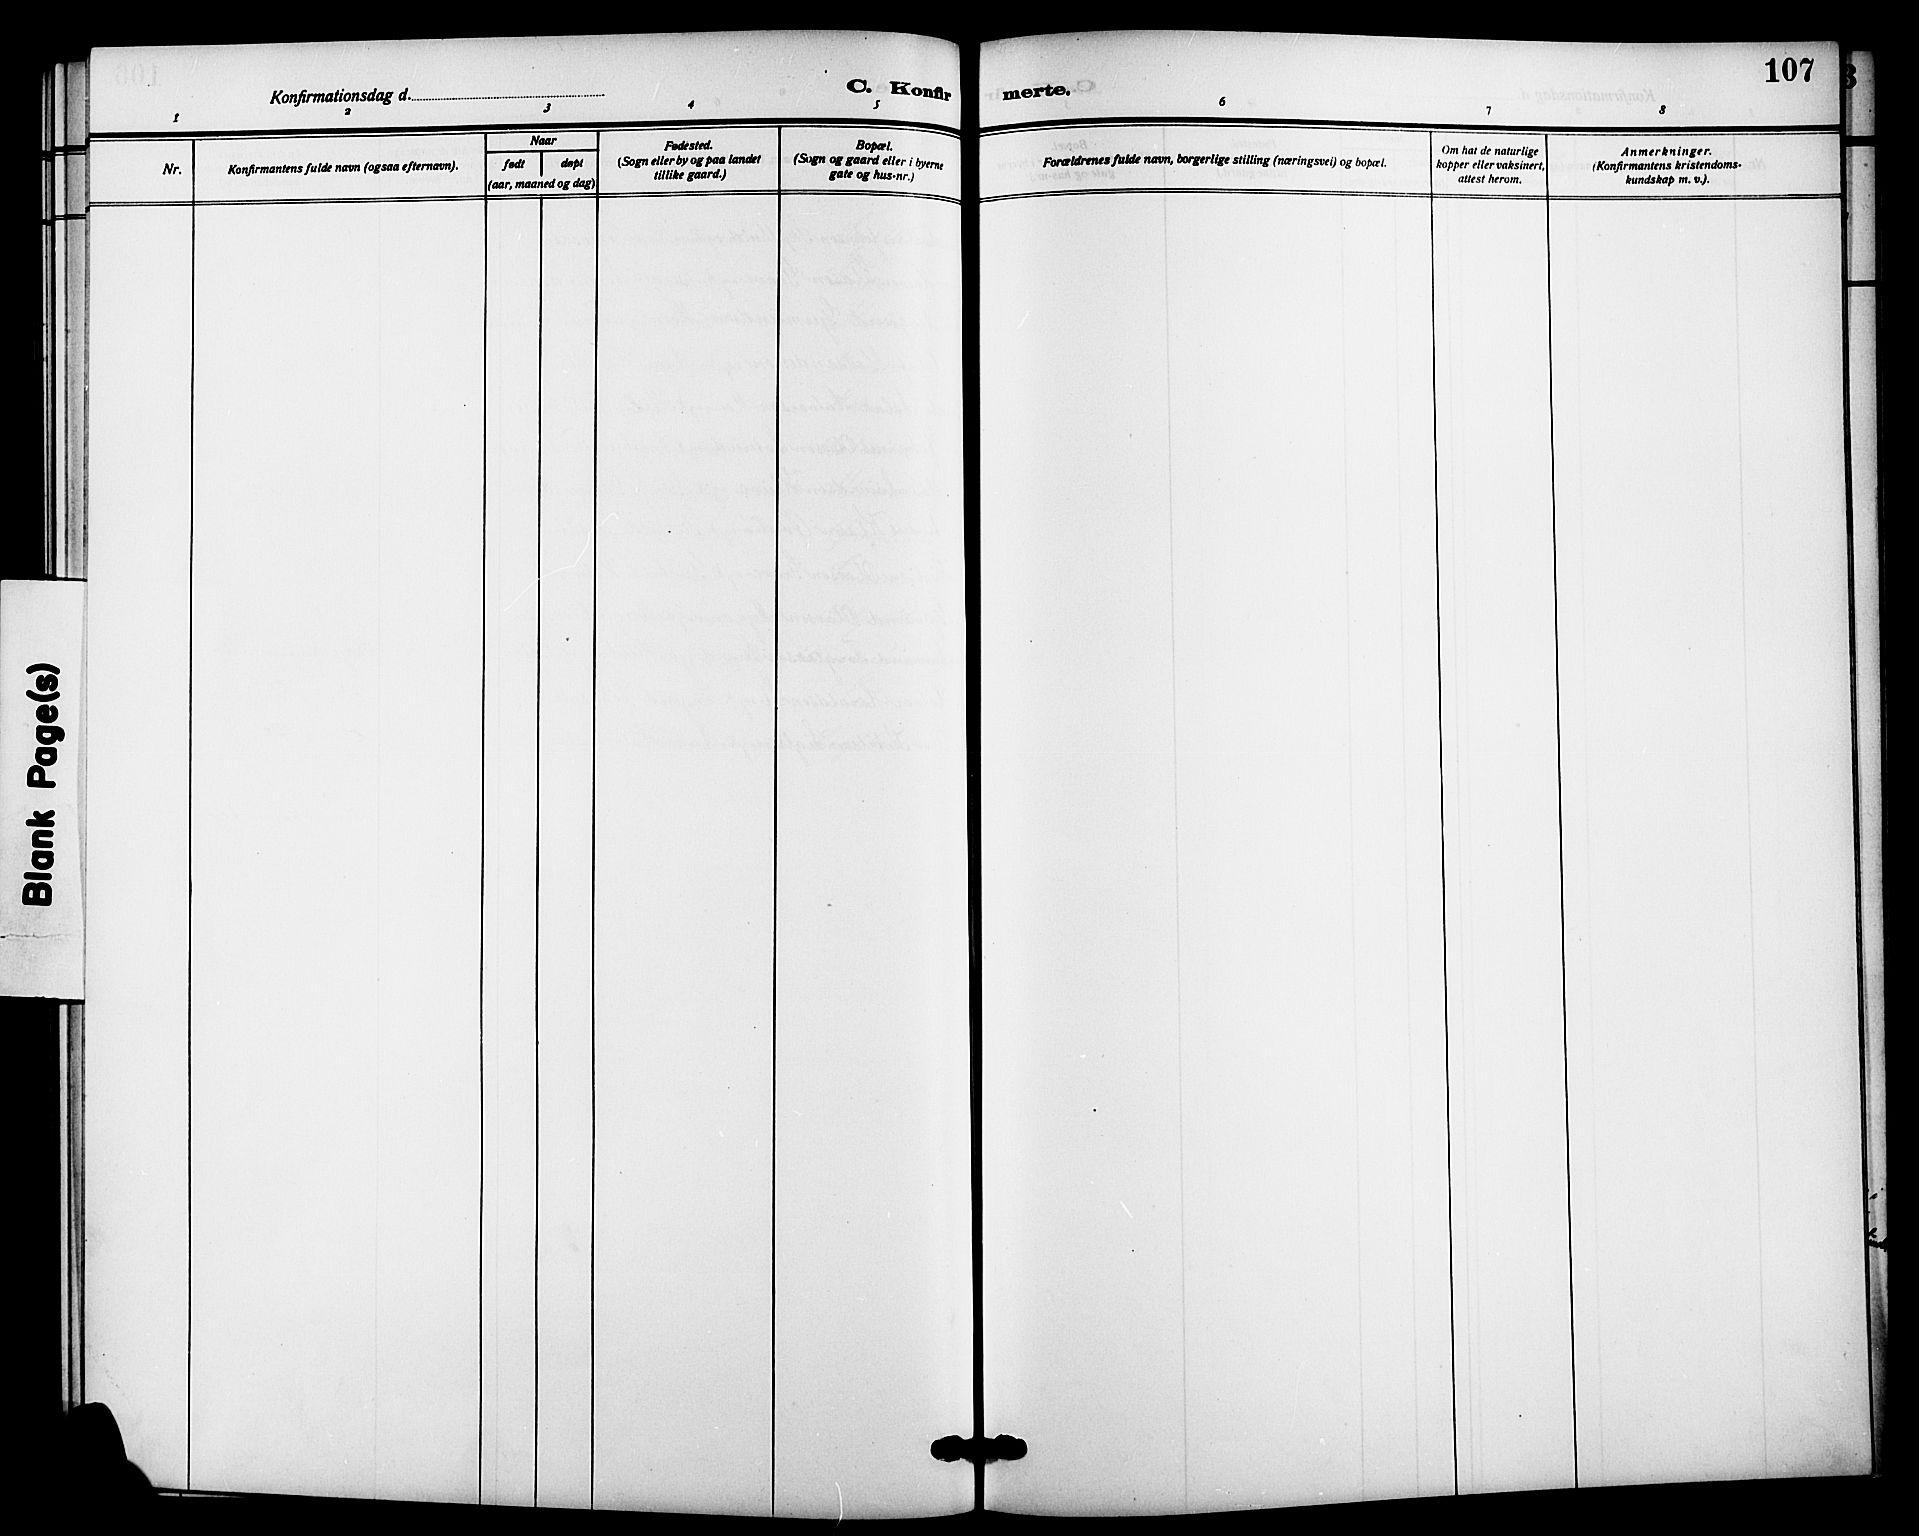 SAKO, Bø kirkebøker, G/Ga/L0007: Klokkerbok nr. 7, 1909-1924, s. 107